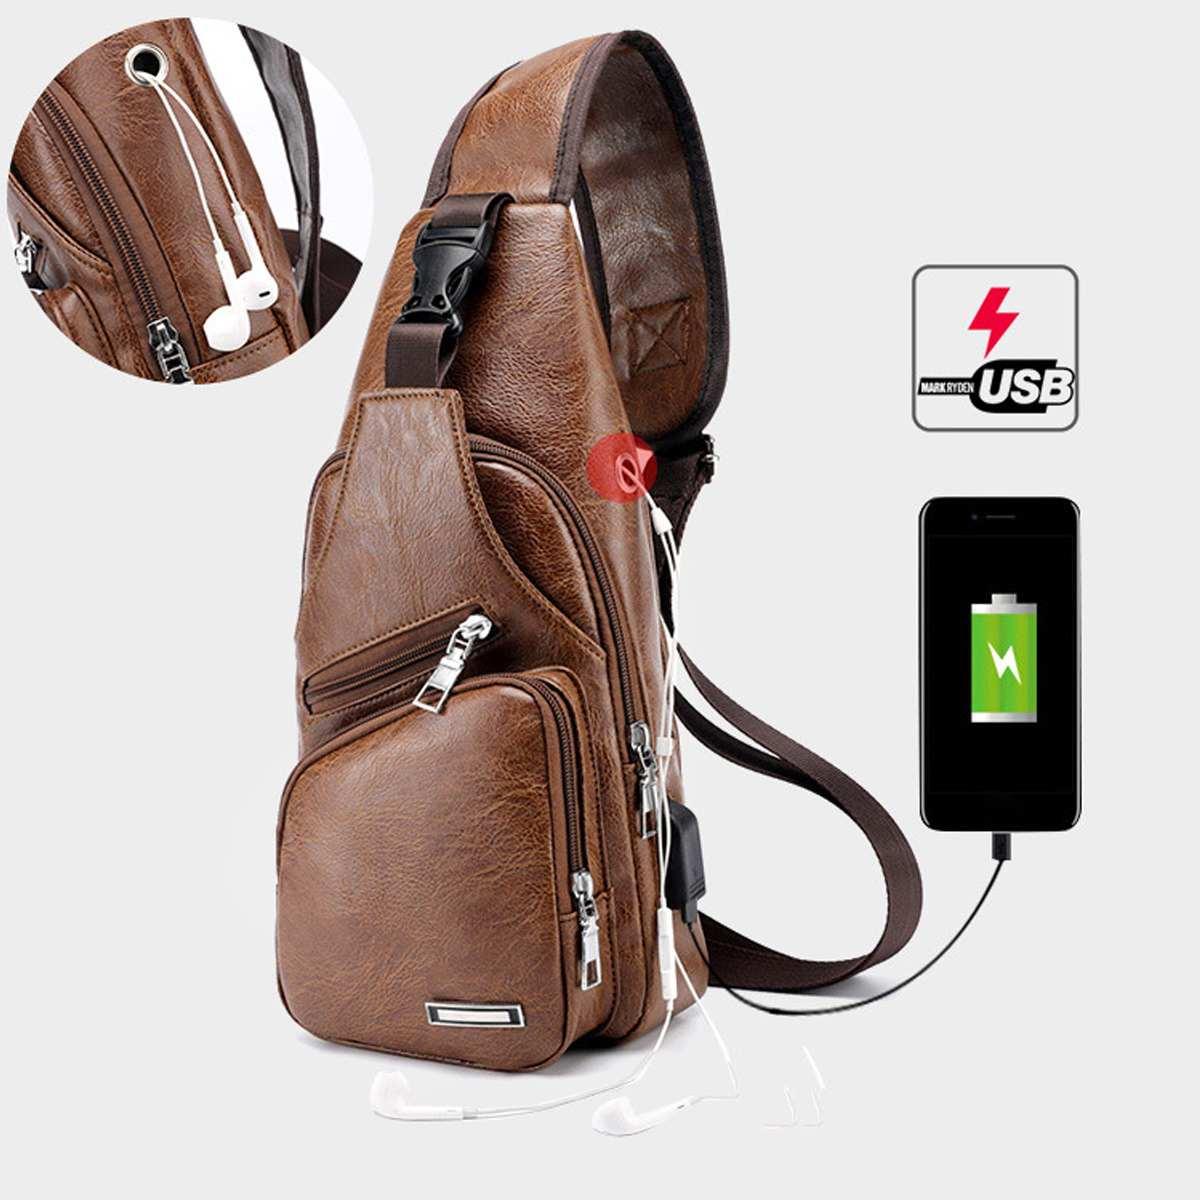 New Men's Chest Bag USB Charging Crossbody Bags PU Leather Shoulder Bag Diagonal Package Back Pack Travel Outdoors Messenger Bag